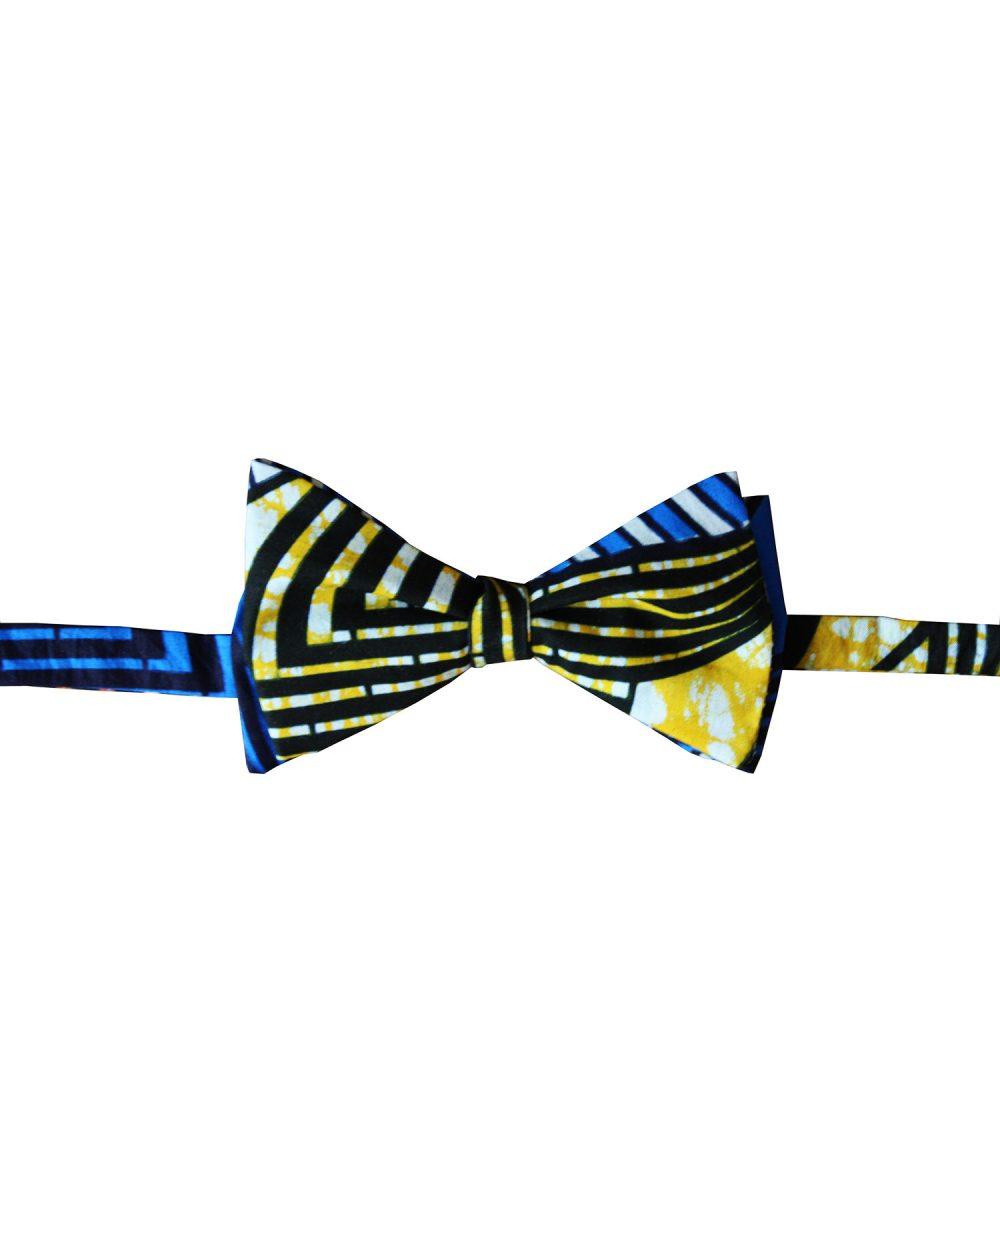 Noeud papillon wax homme bleu jaune | Kipé